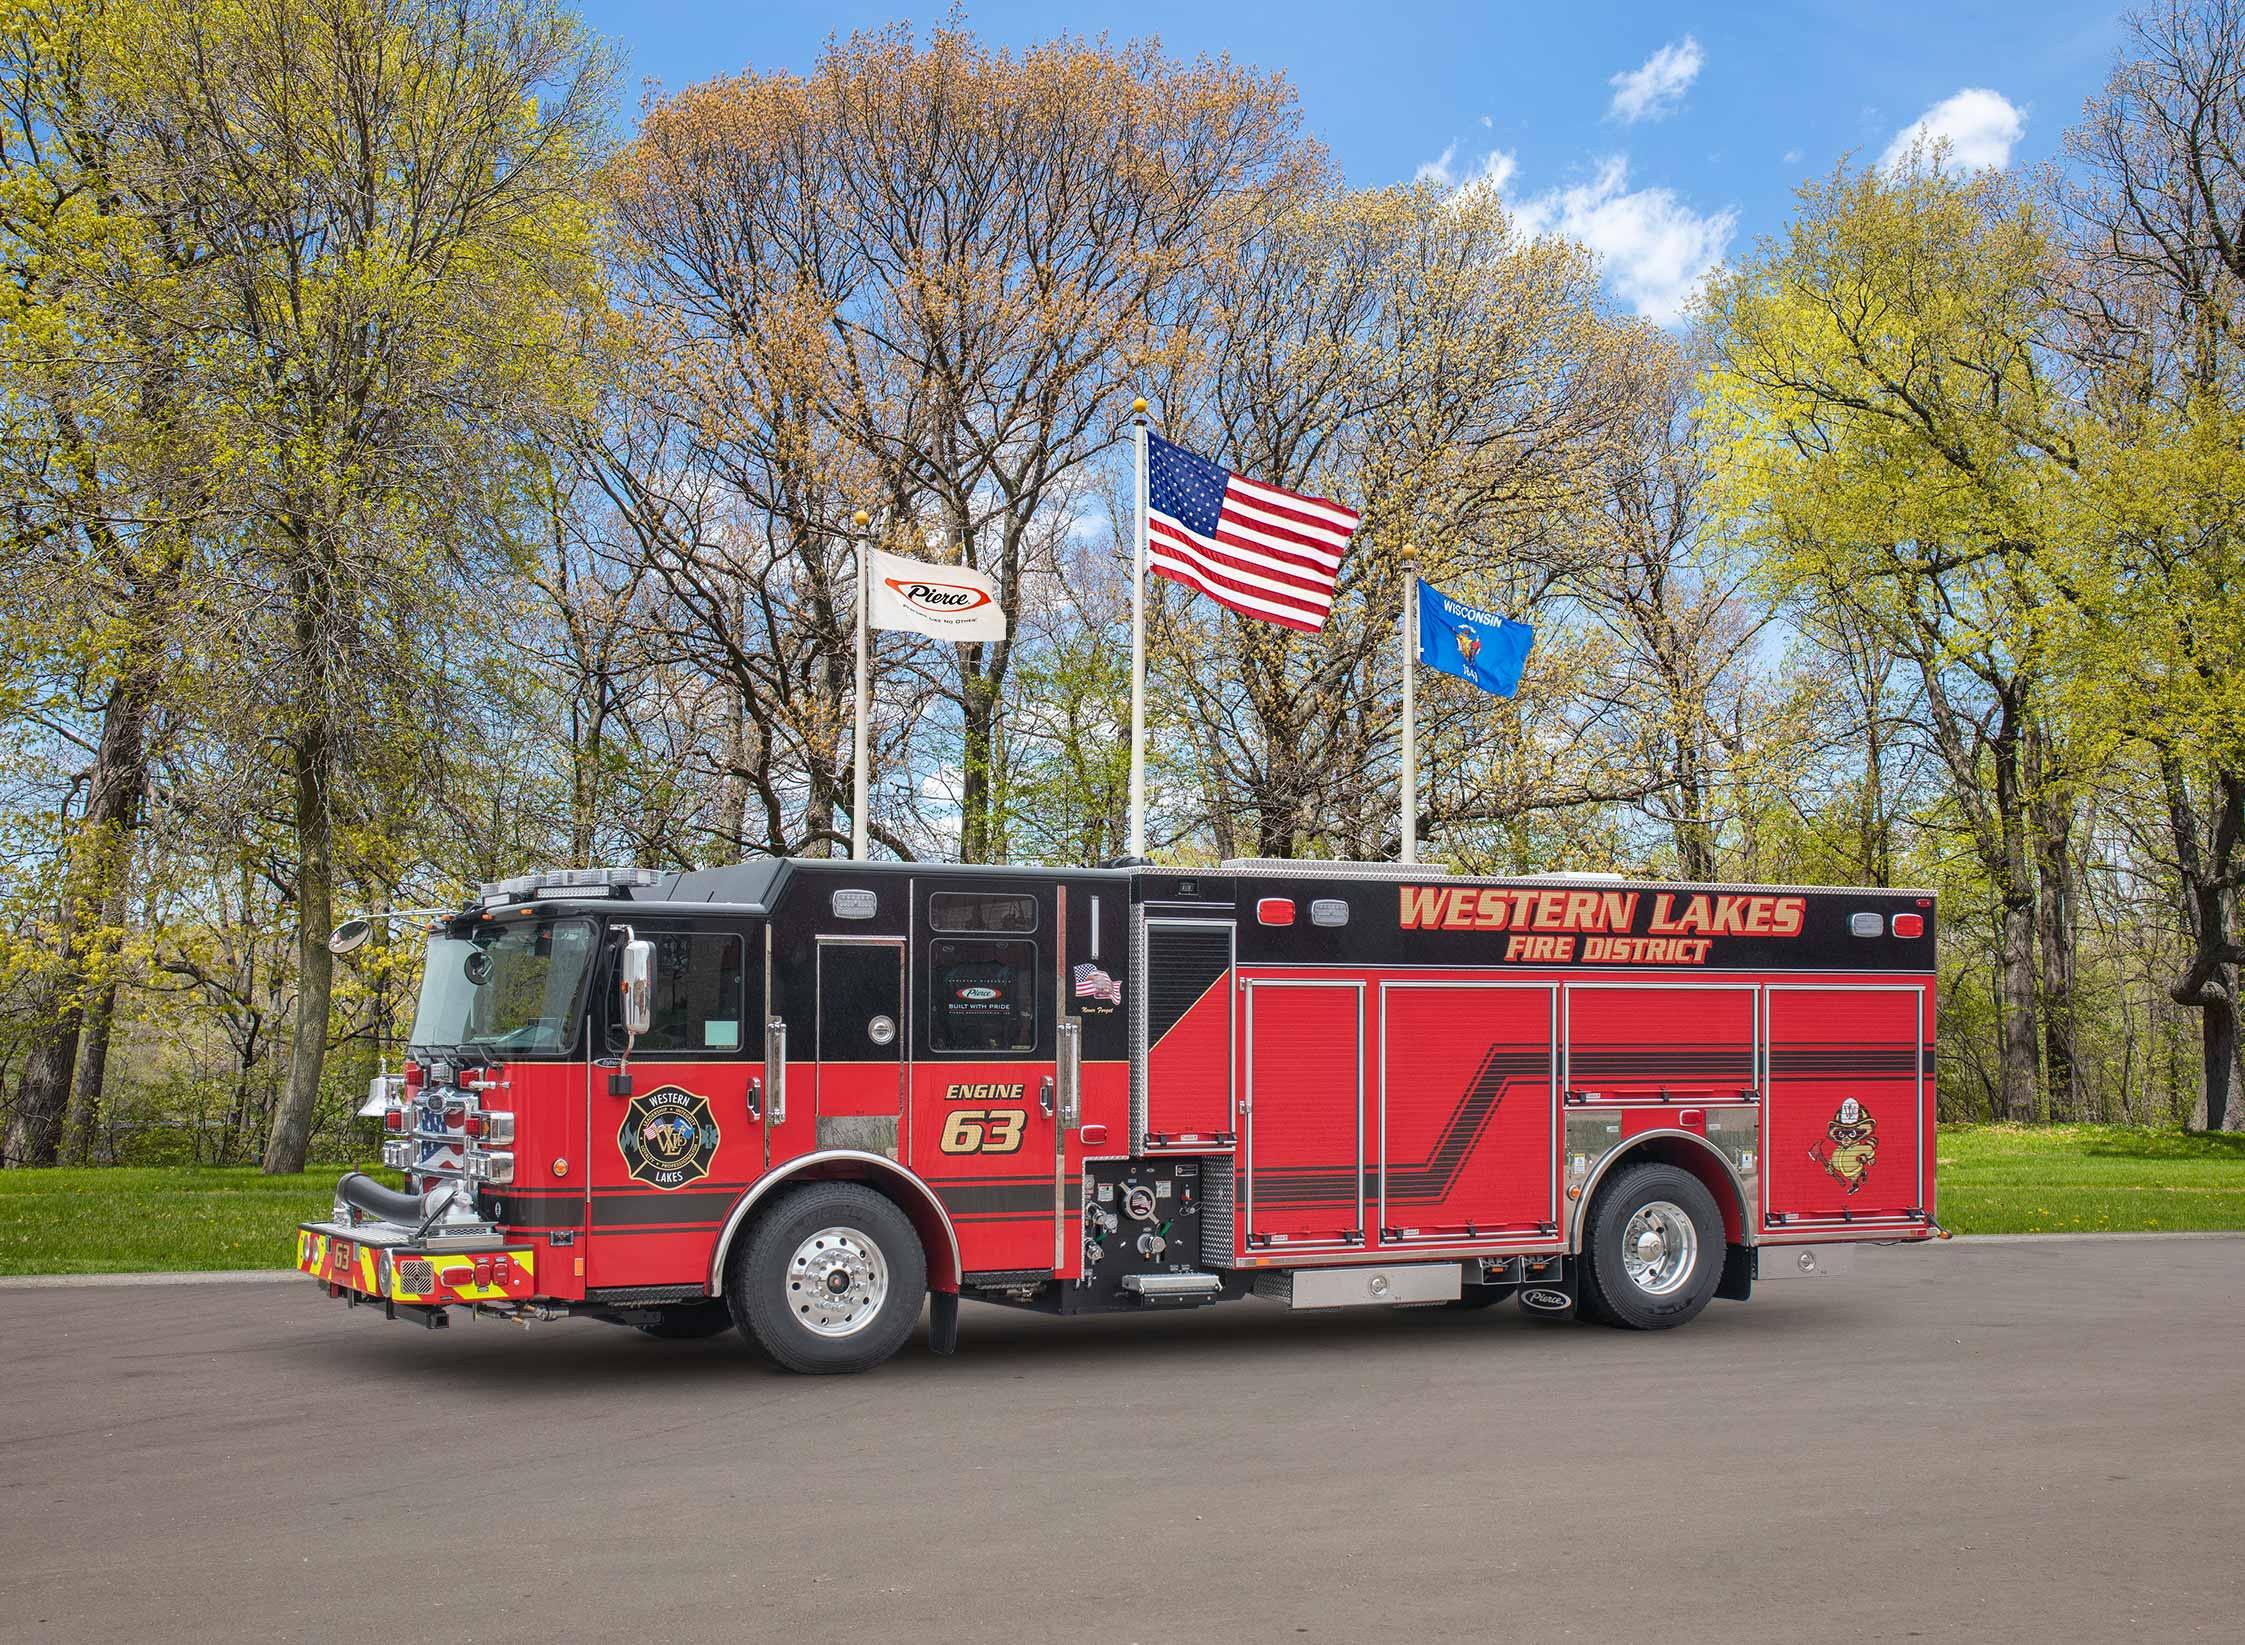 Western Lakes Fire District - Pumper